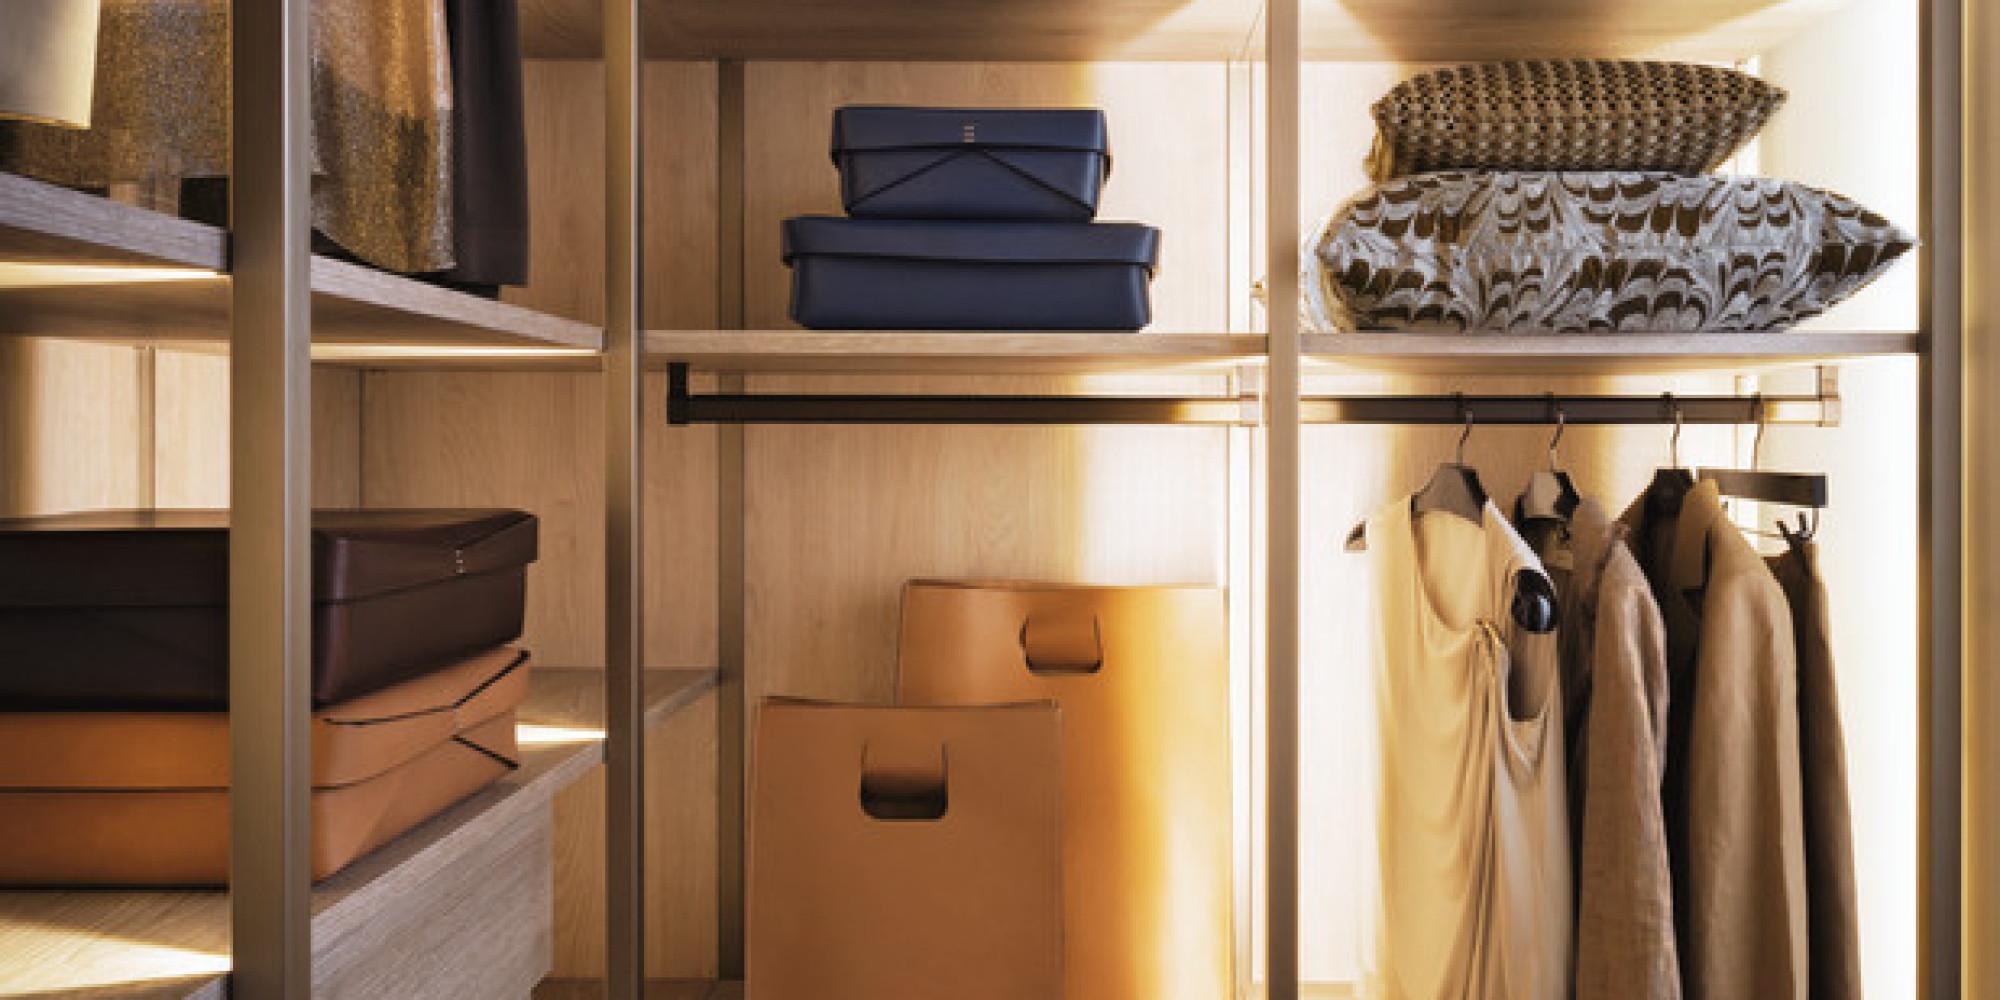 Cabina armadio mondo convenienza camera da letto con armadio a ponte consigli armadi a ponte - Costo cabina armadio ikea ...